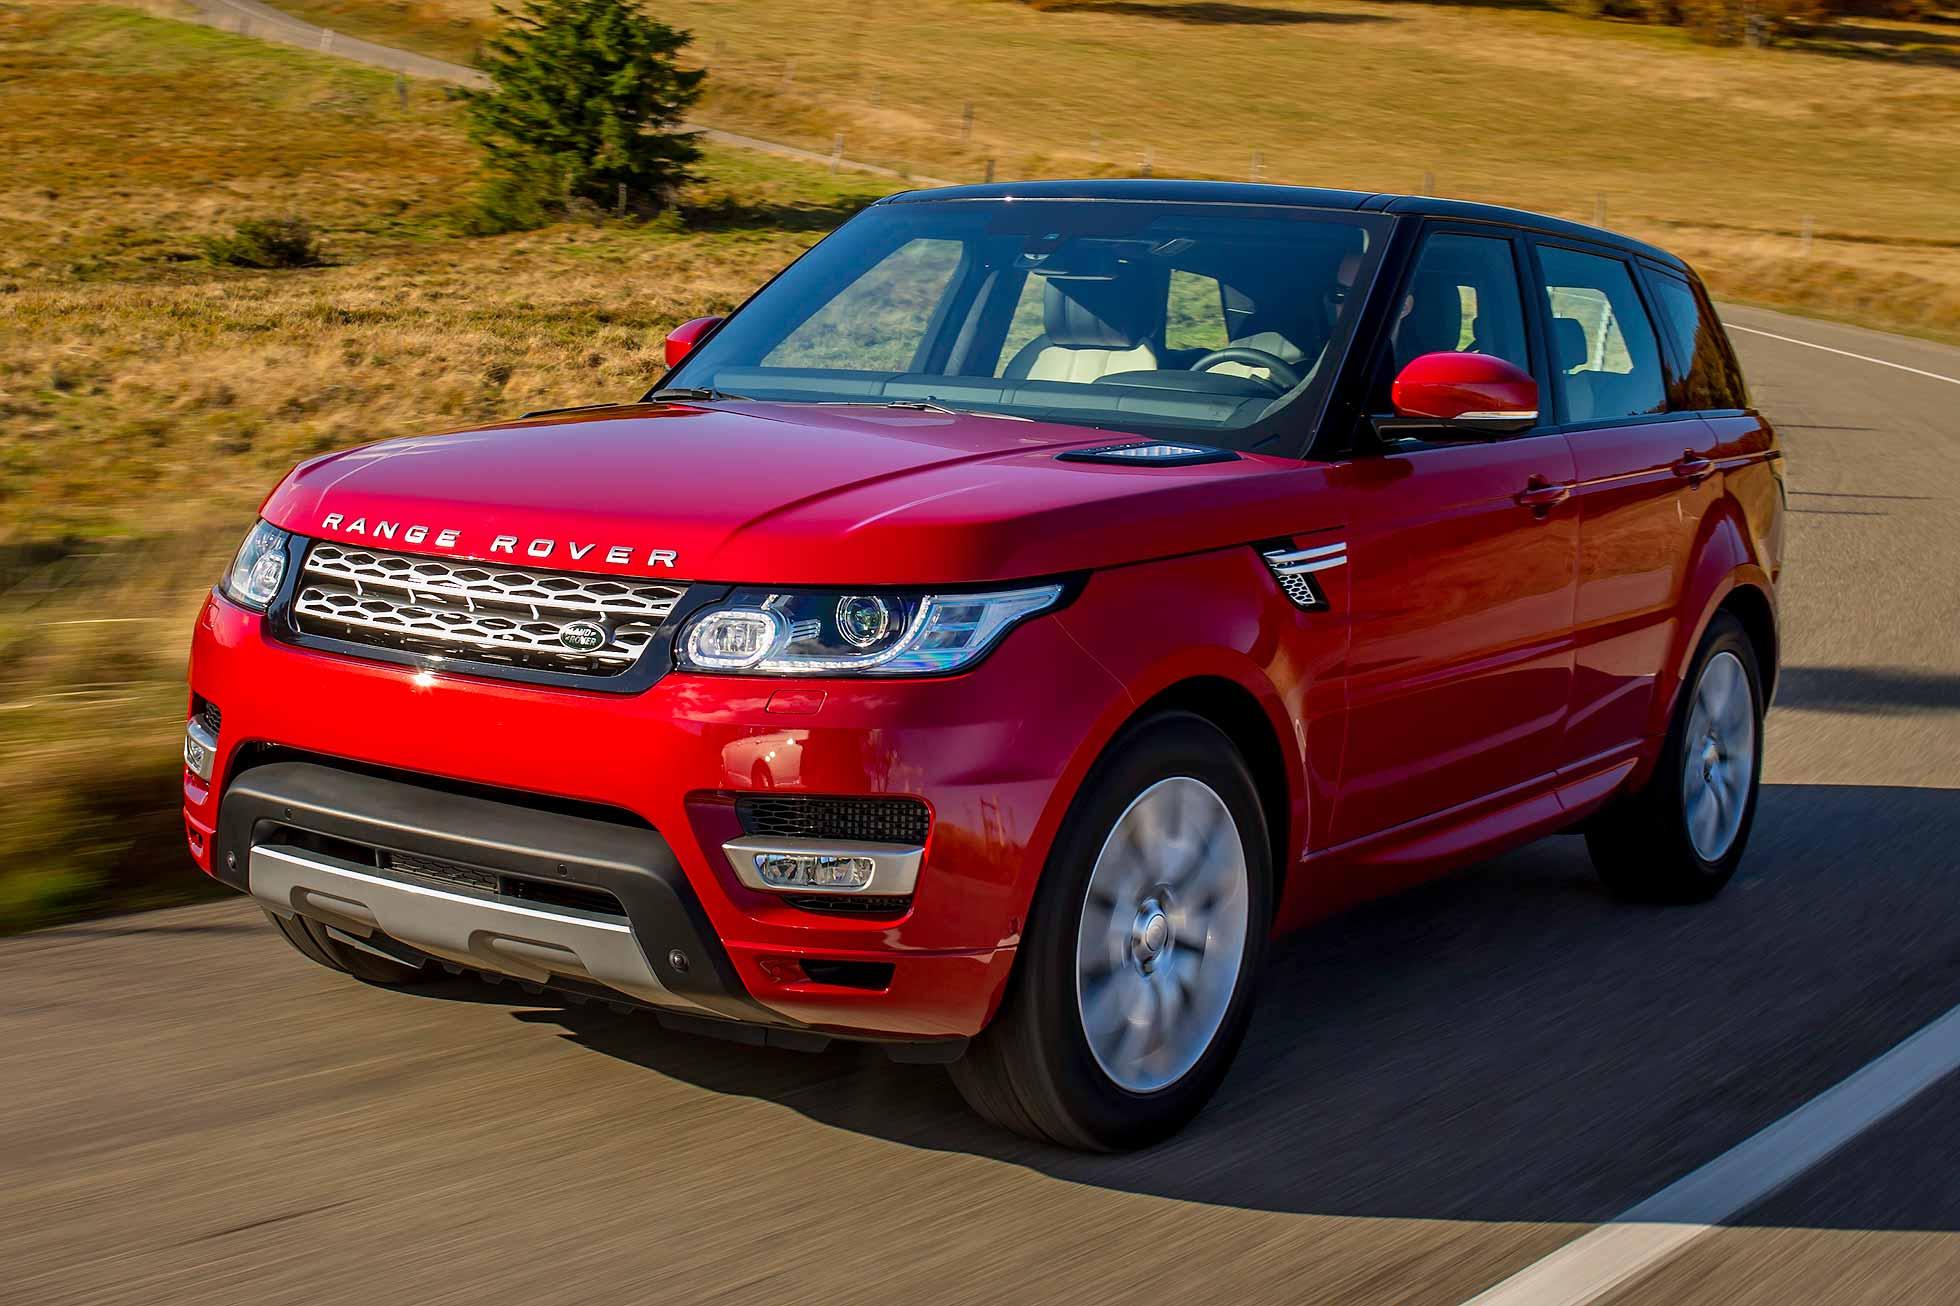 Range Rover in London car insurance risk